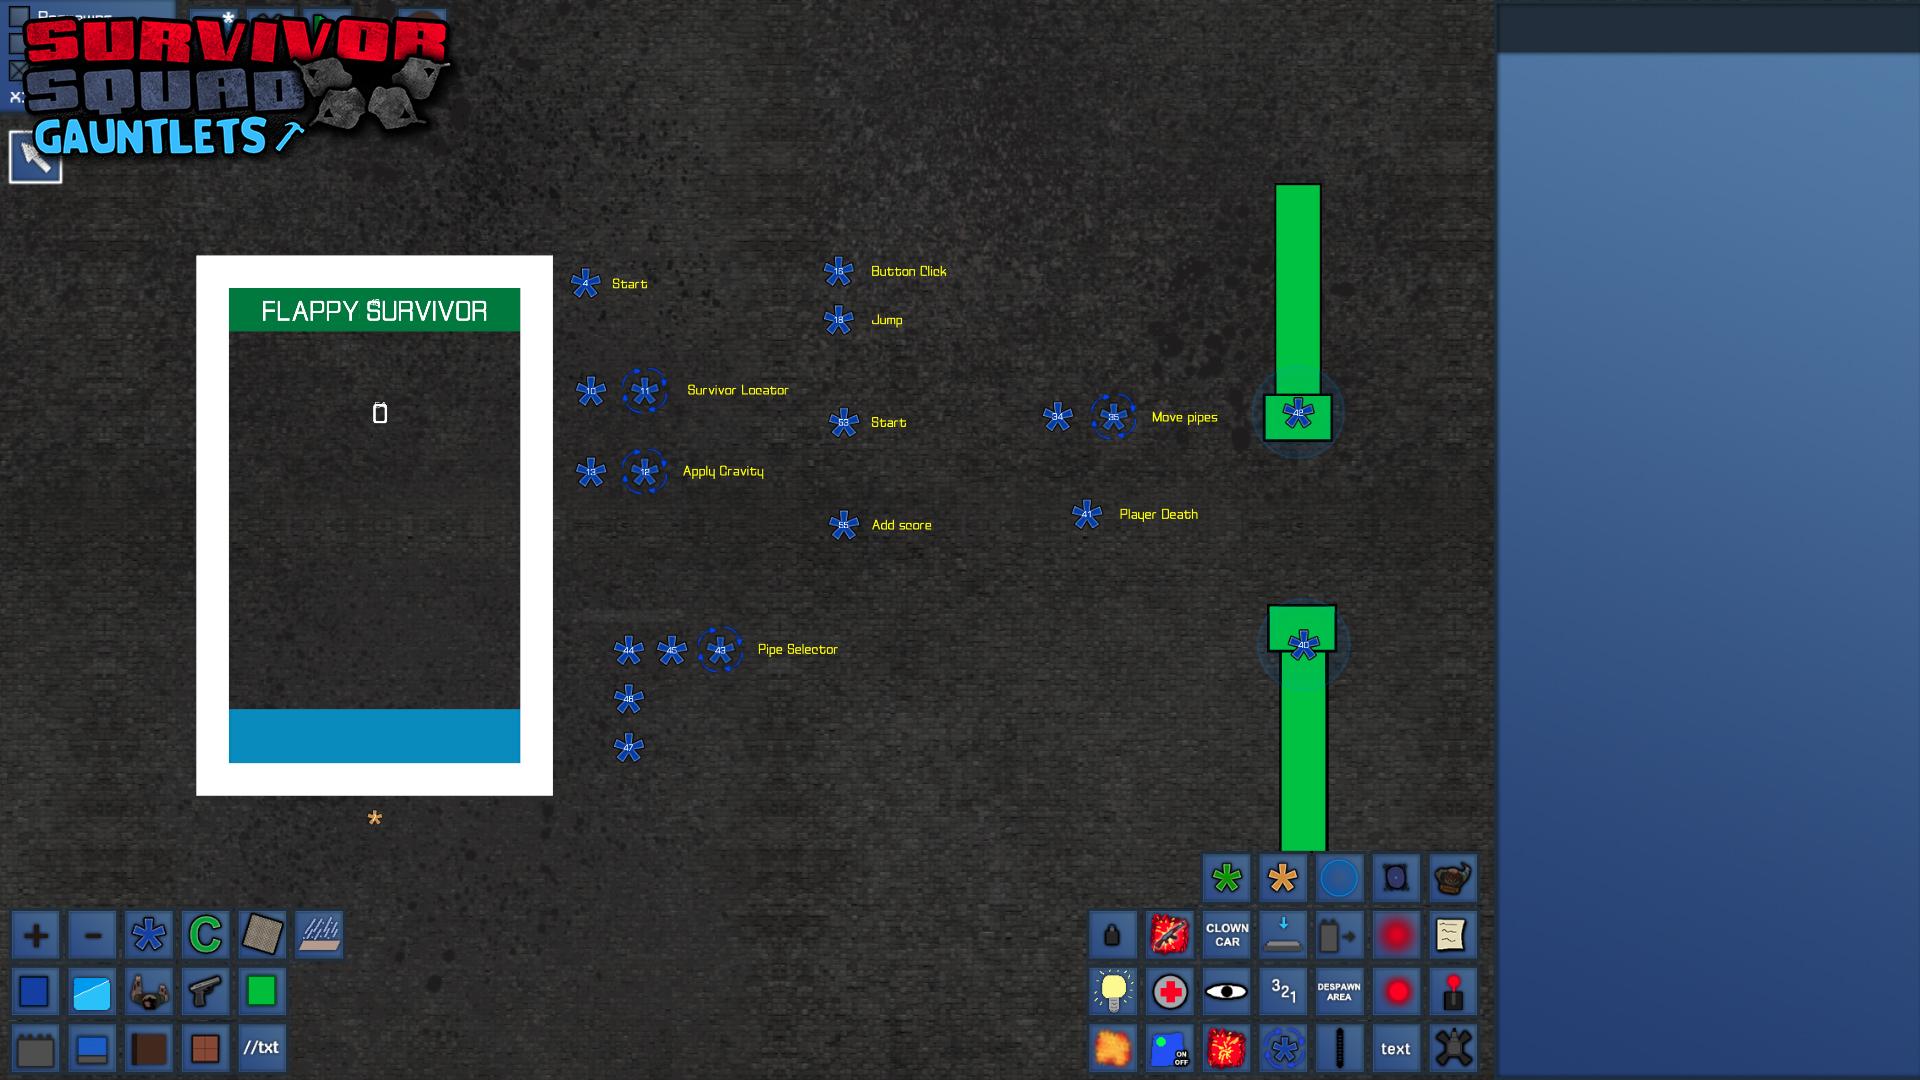 Survivor Squad: Gauntlets screenshot